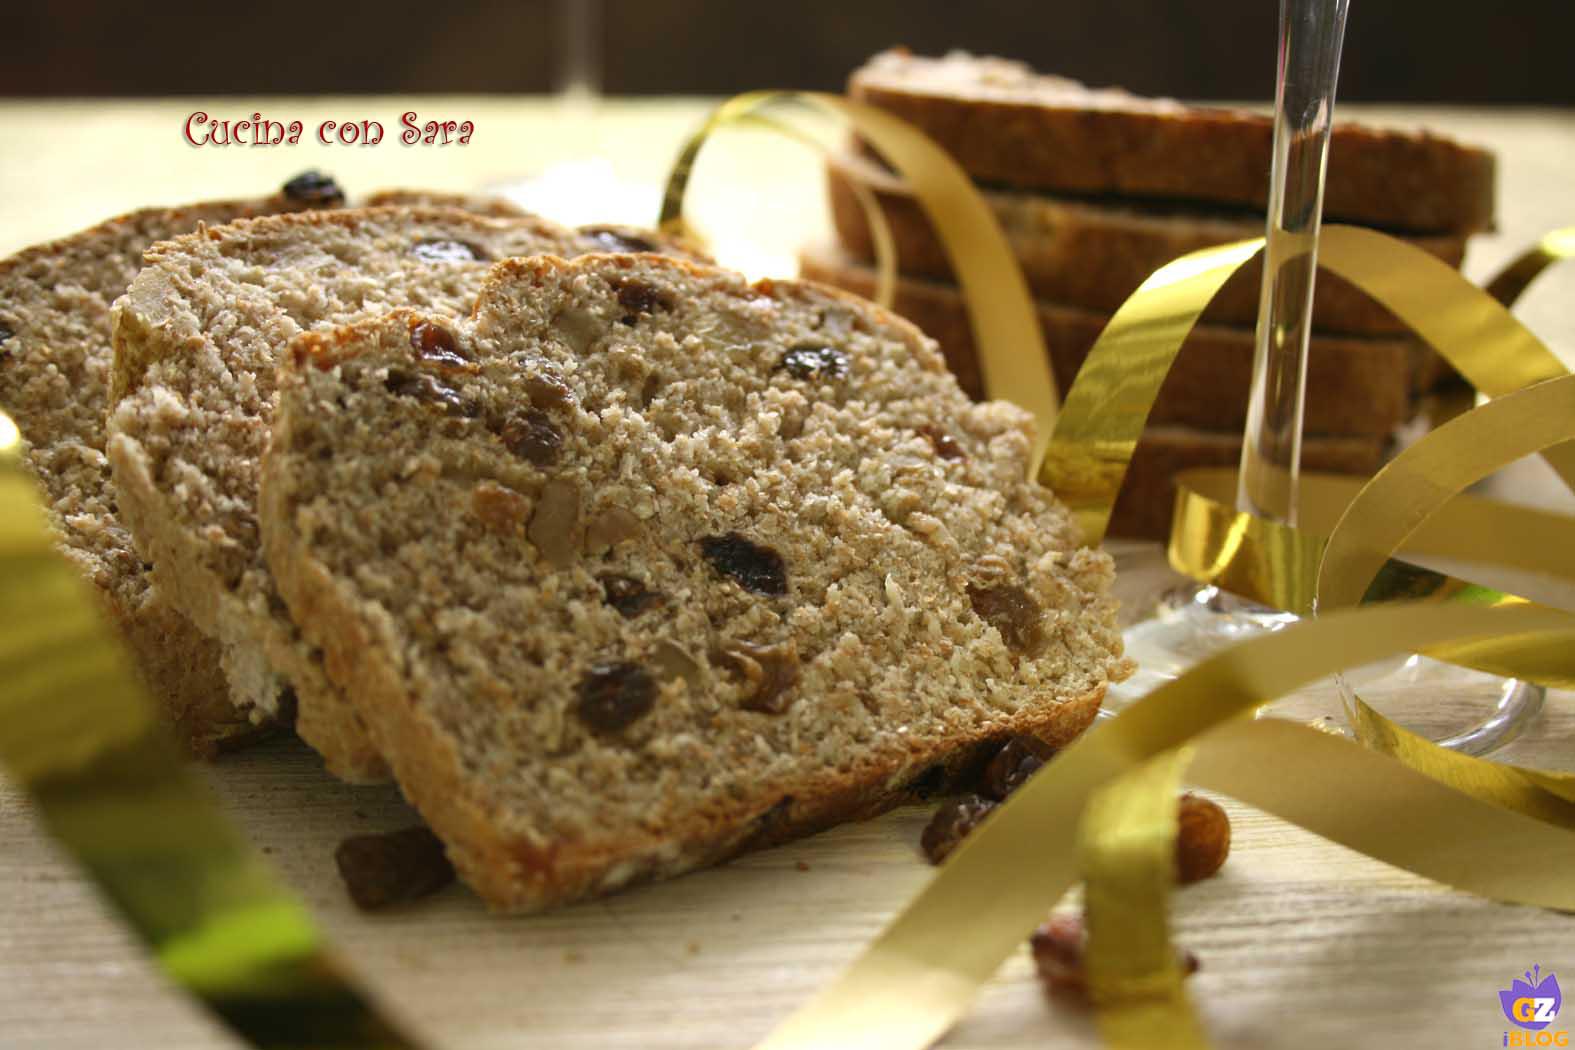 Pane integrale con uvetta e noci, cucina con sara